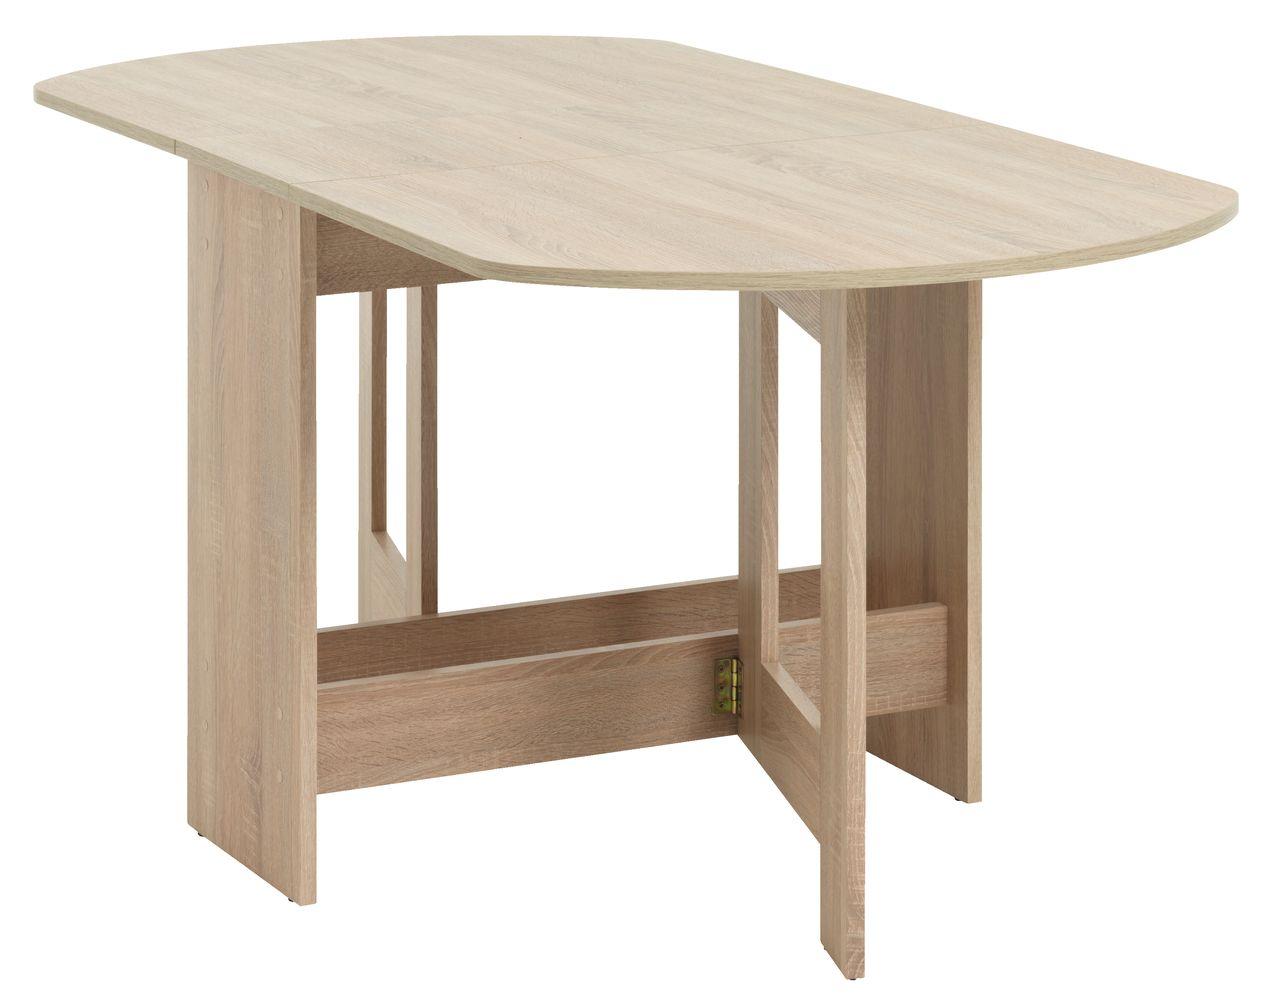 Folding Dining Table OBLING Brushed Oak